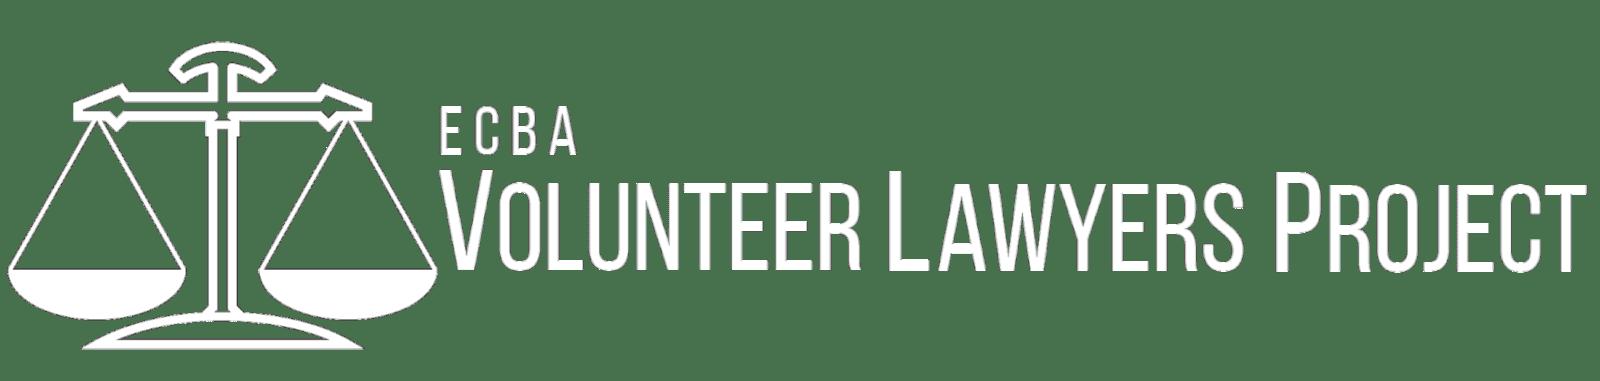 ECBA Volunteer Lawyers Project